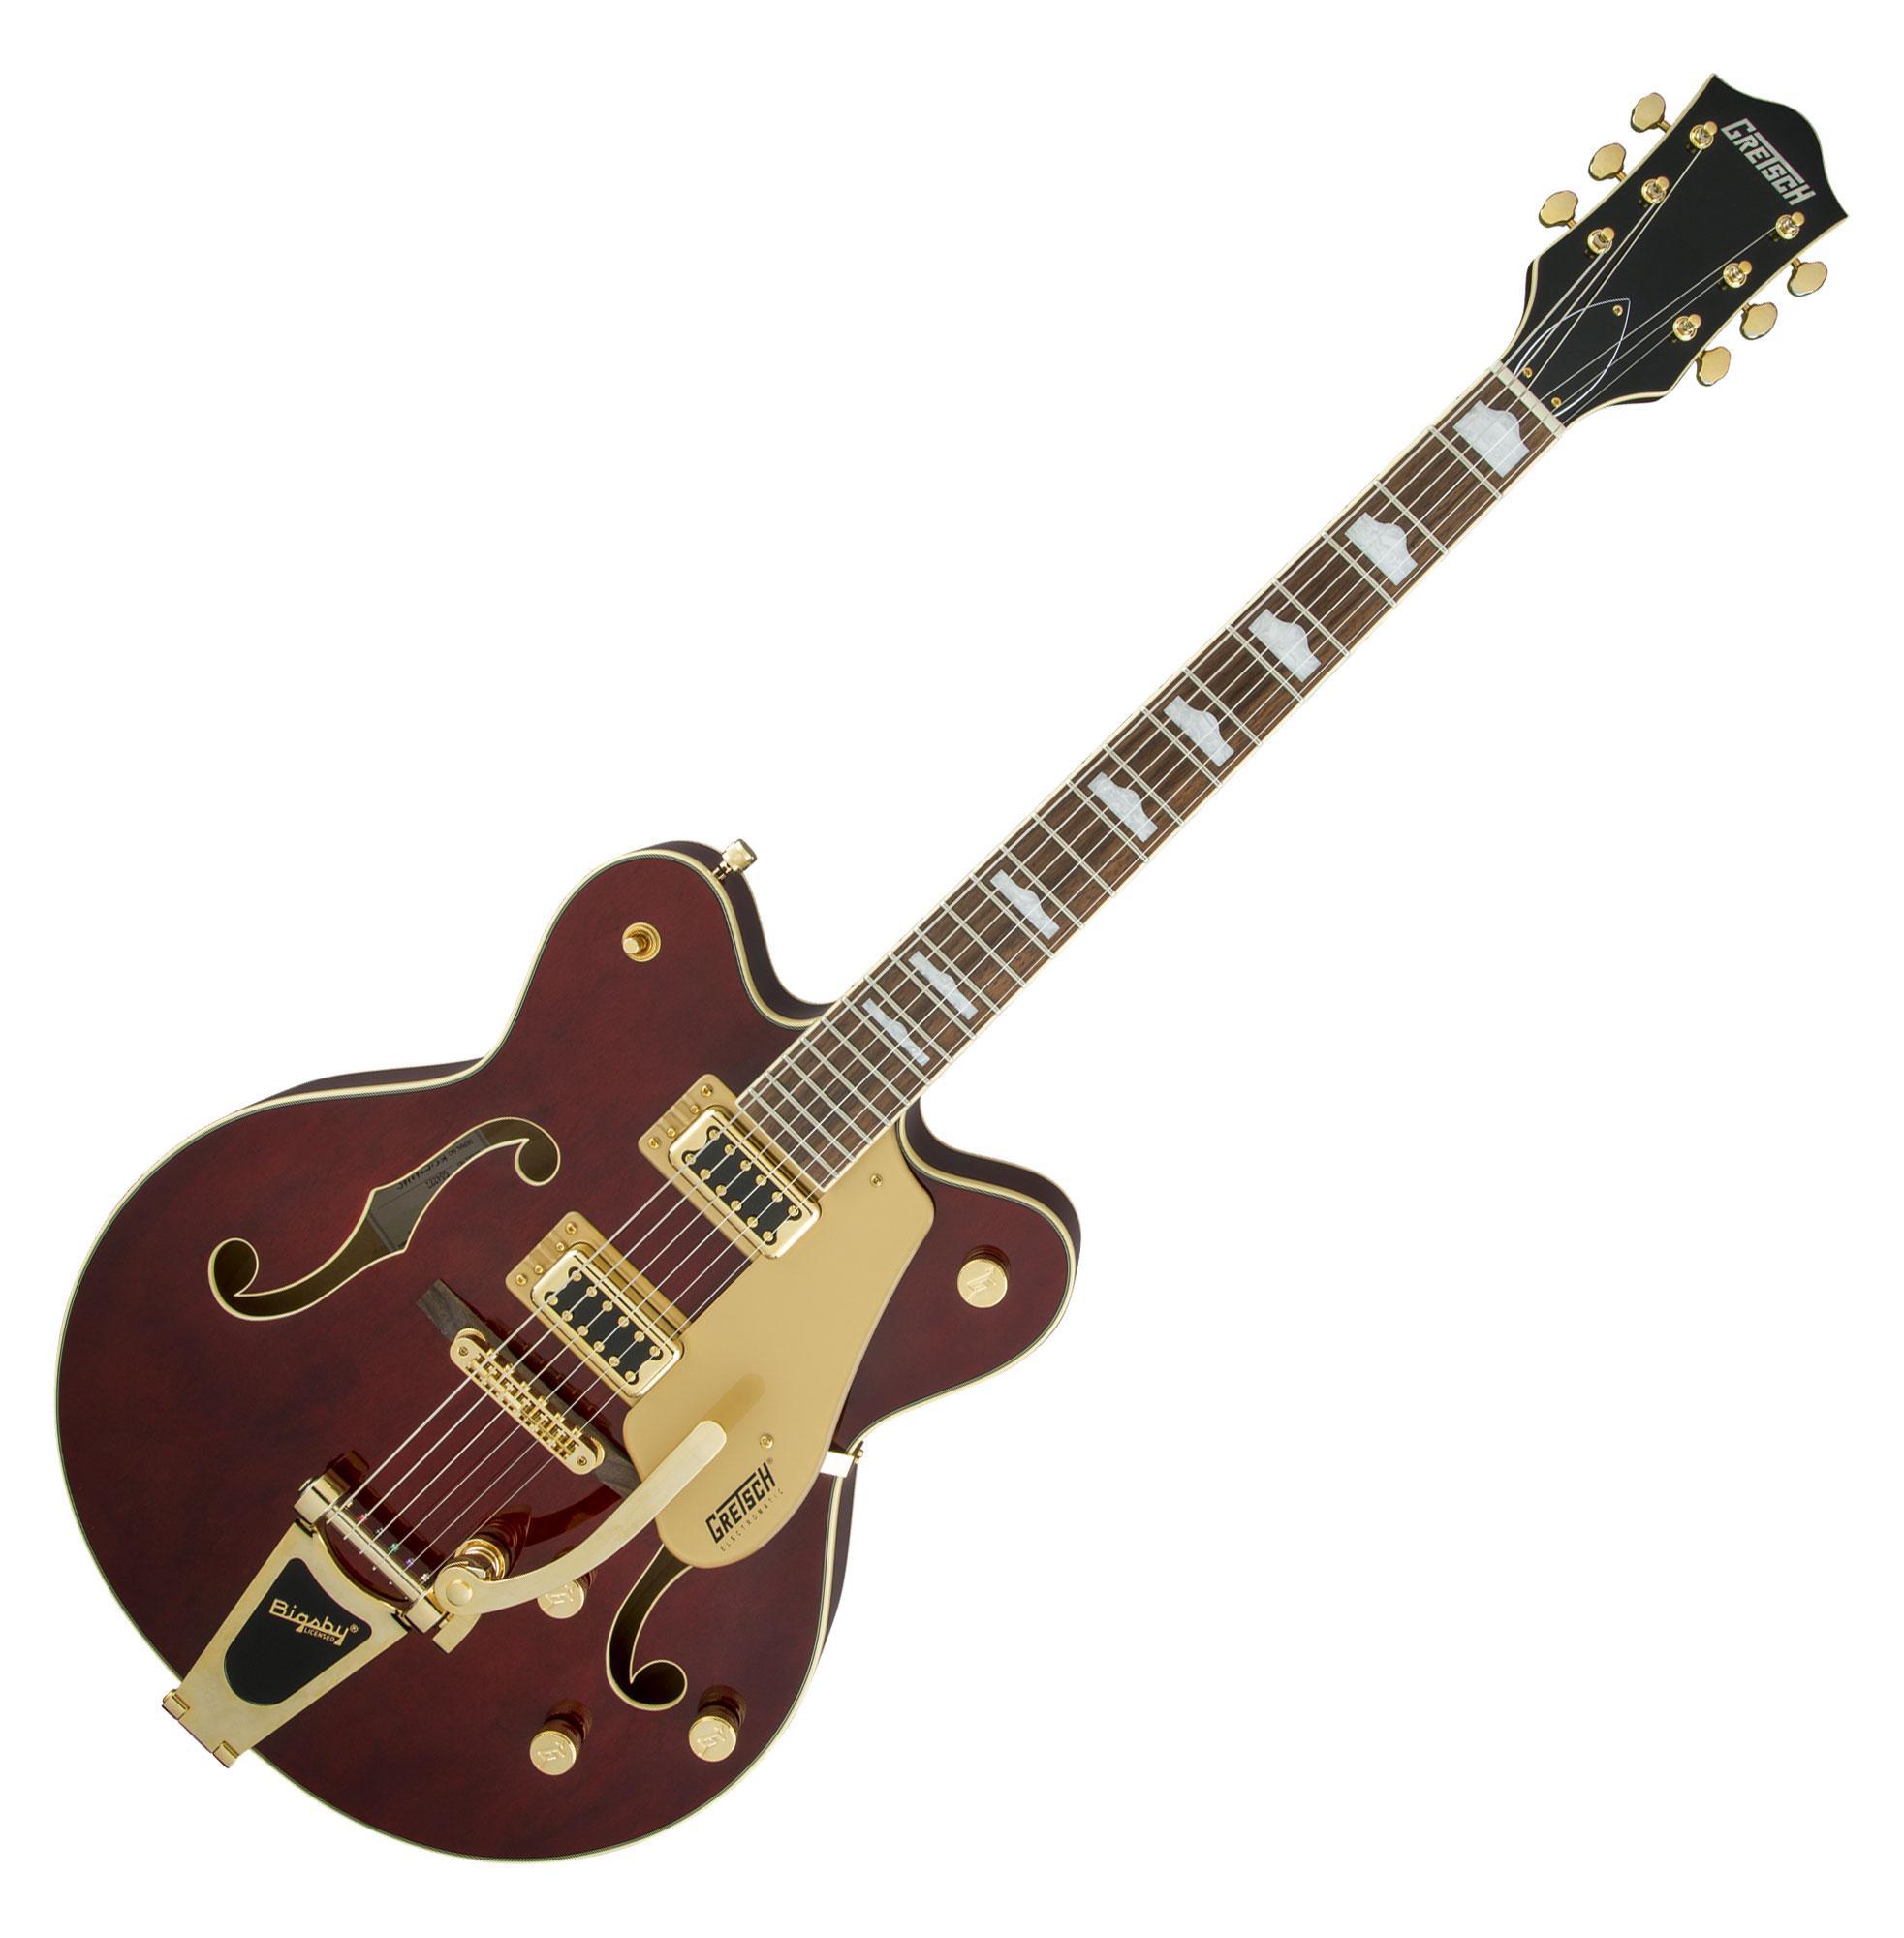 Egitarren - Gretsch G5422TG HLW DC WLN - Onlineshop Musikhaus Kirstein